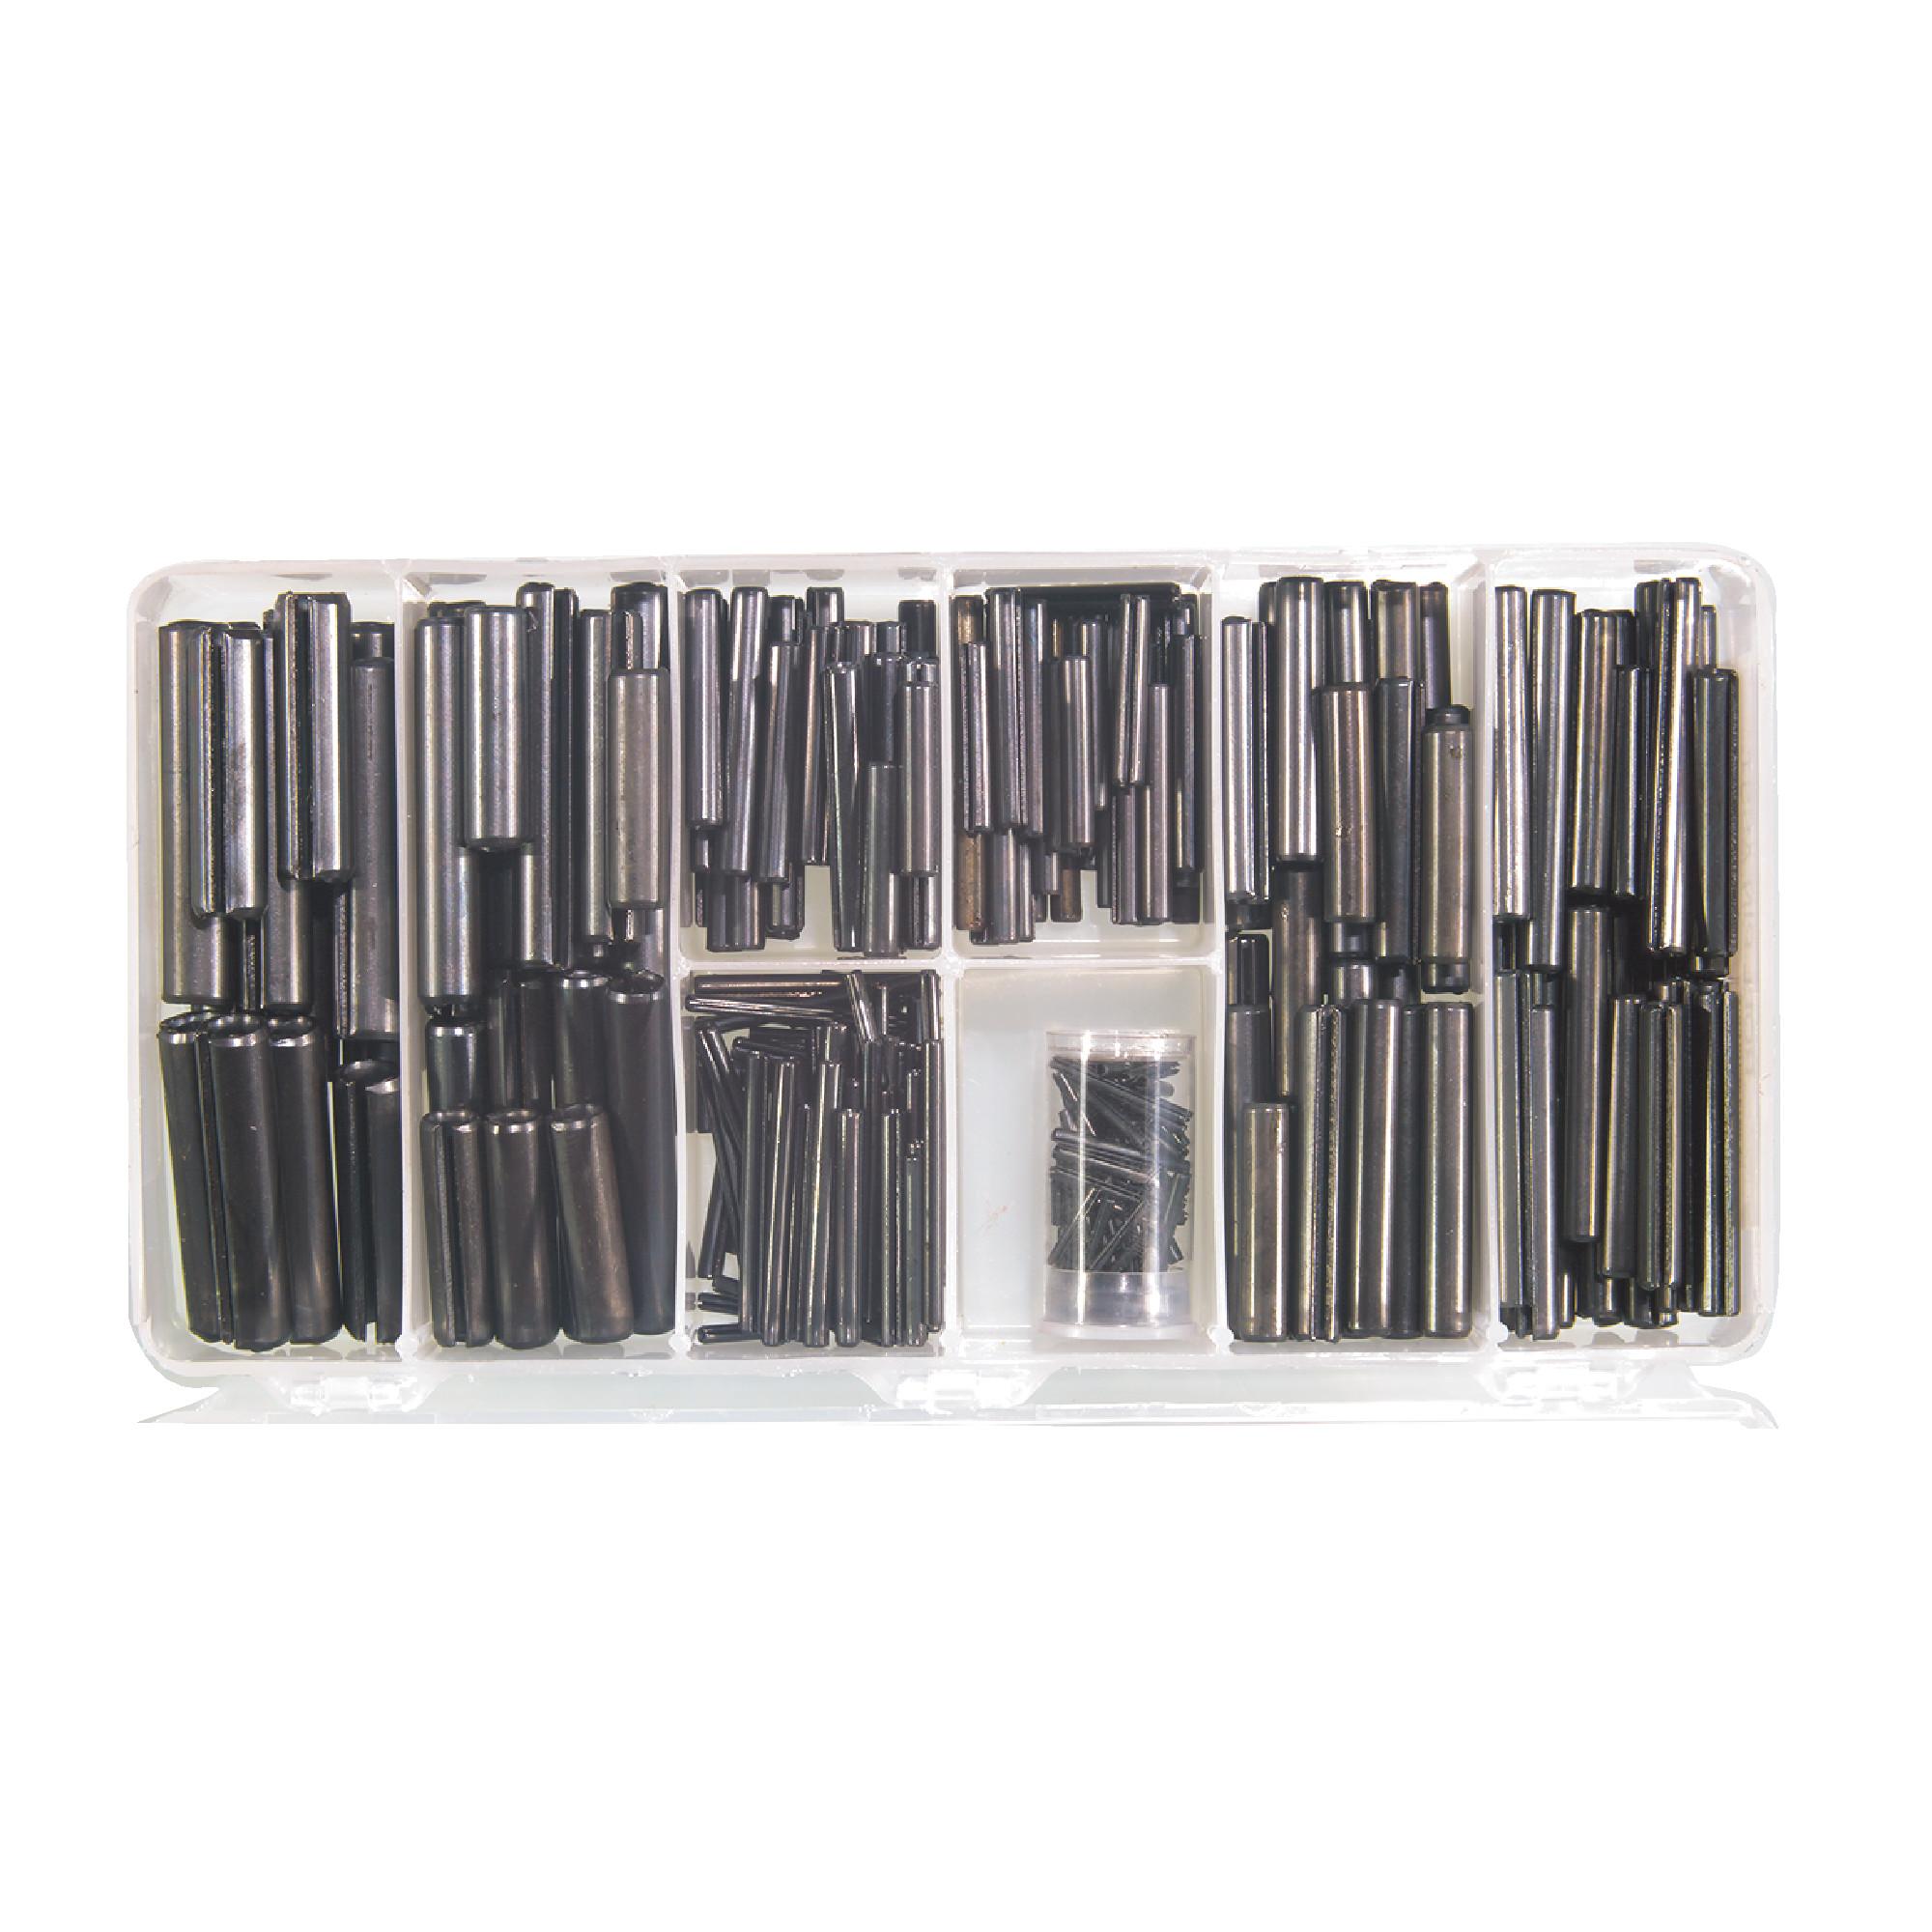 300 Piece Roll Pin Set